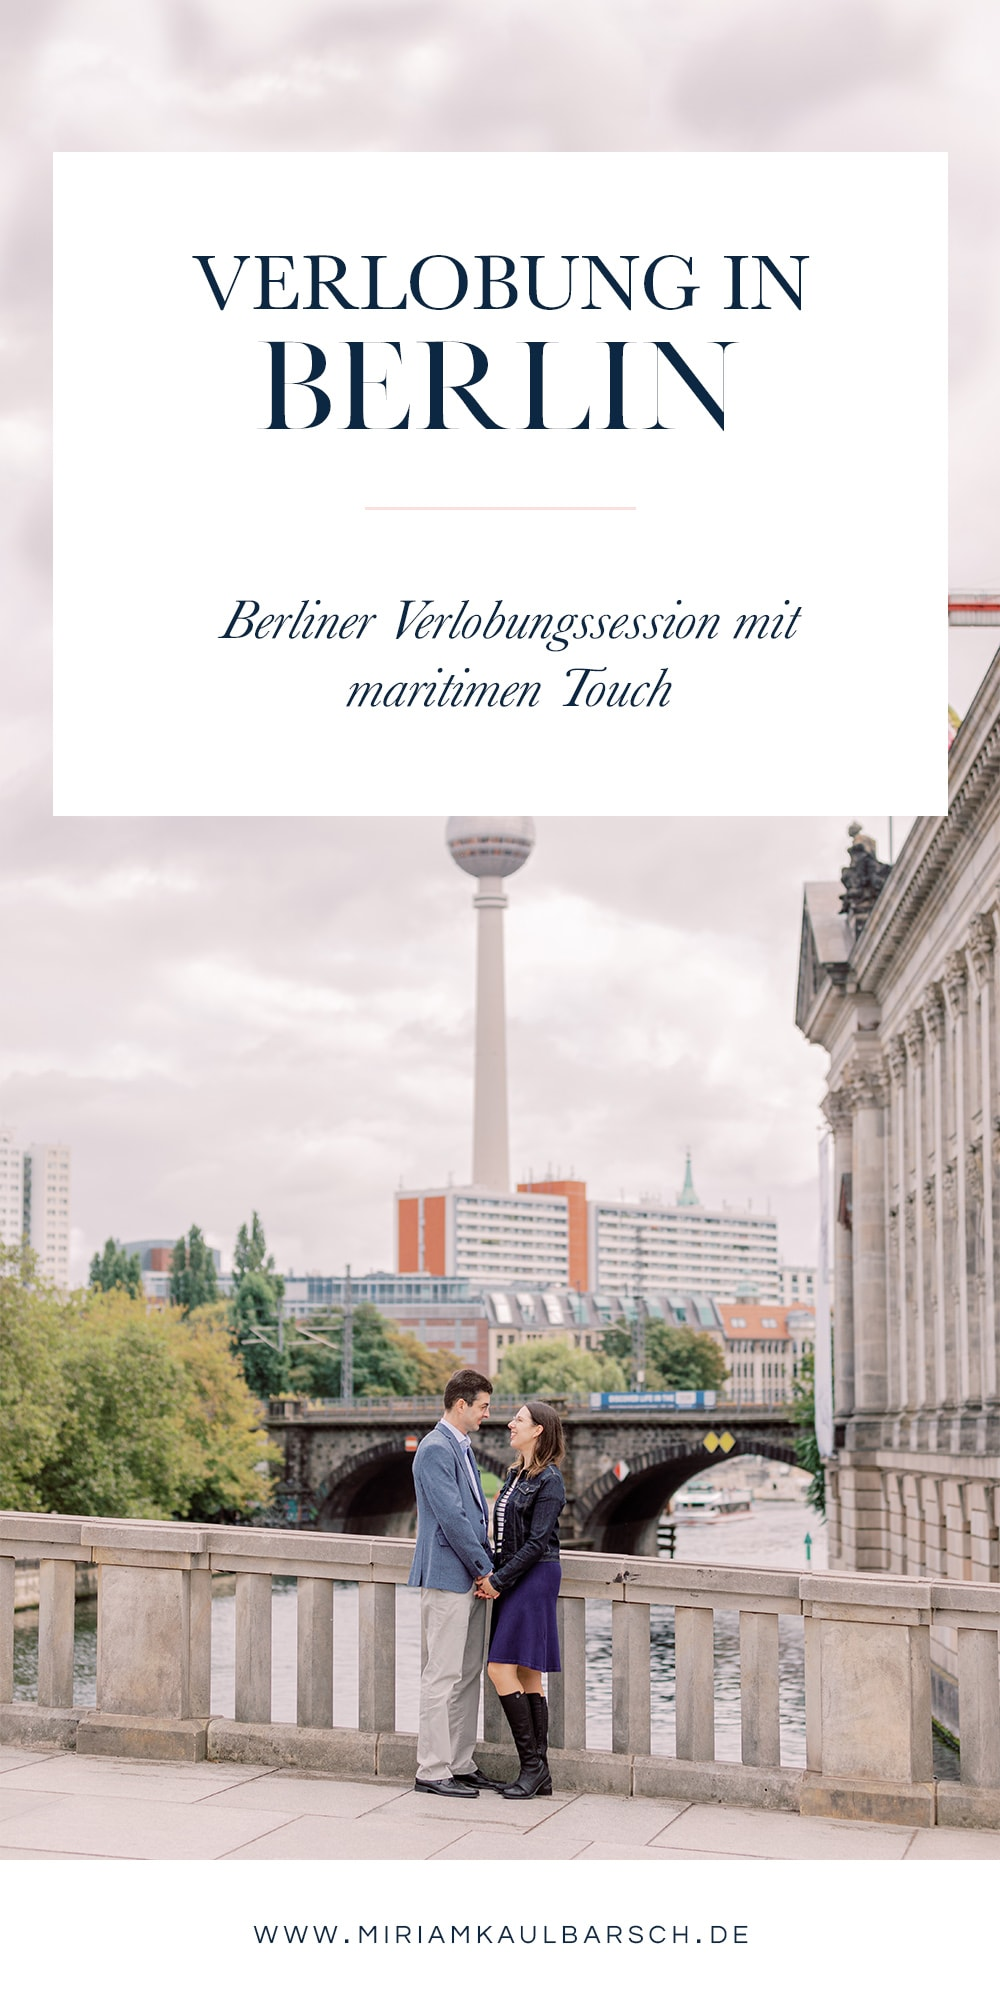 Verlobung mit maritimen Touch in Berlin